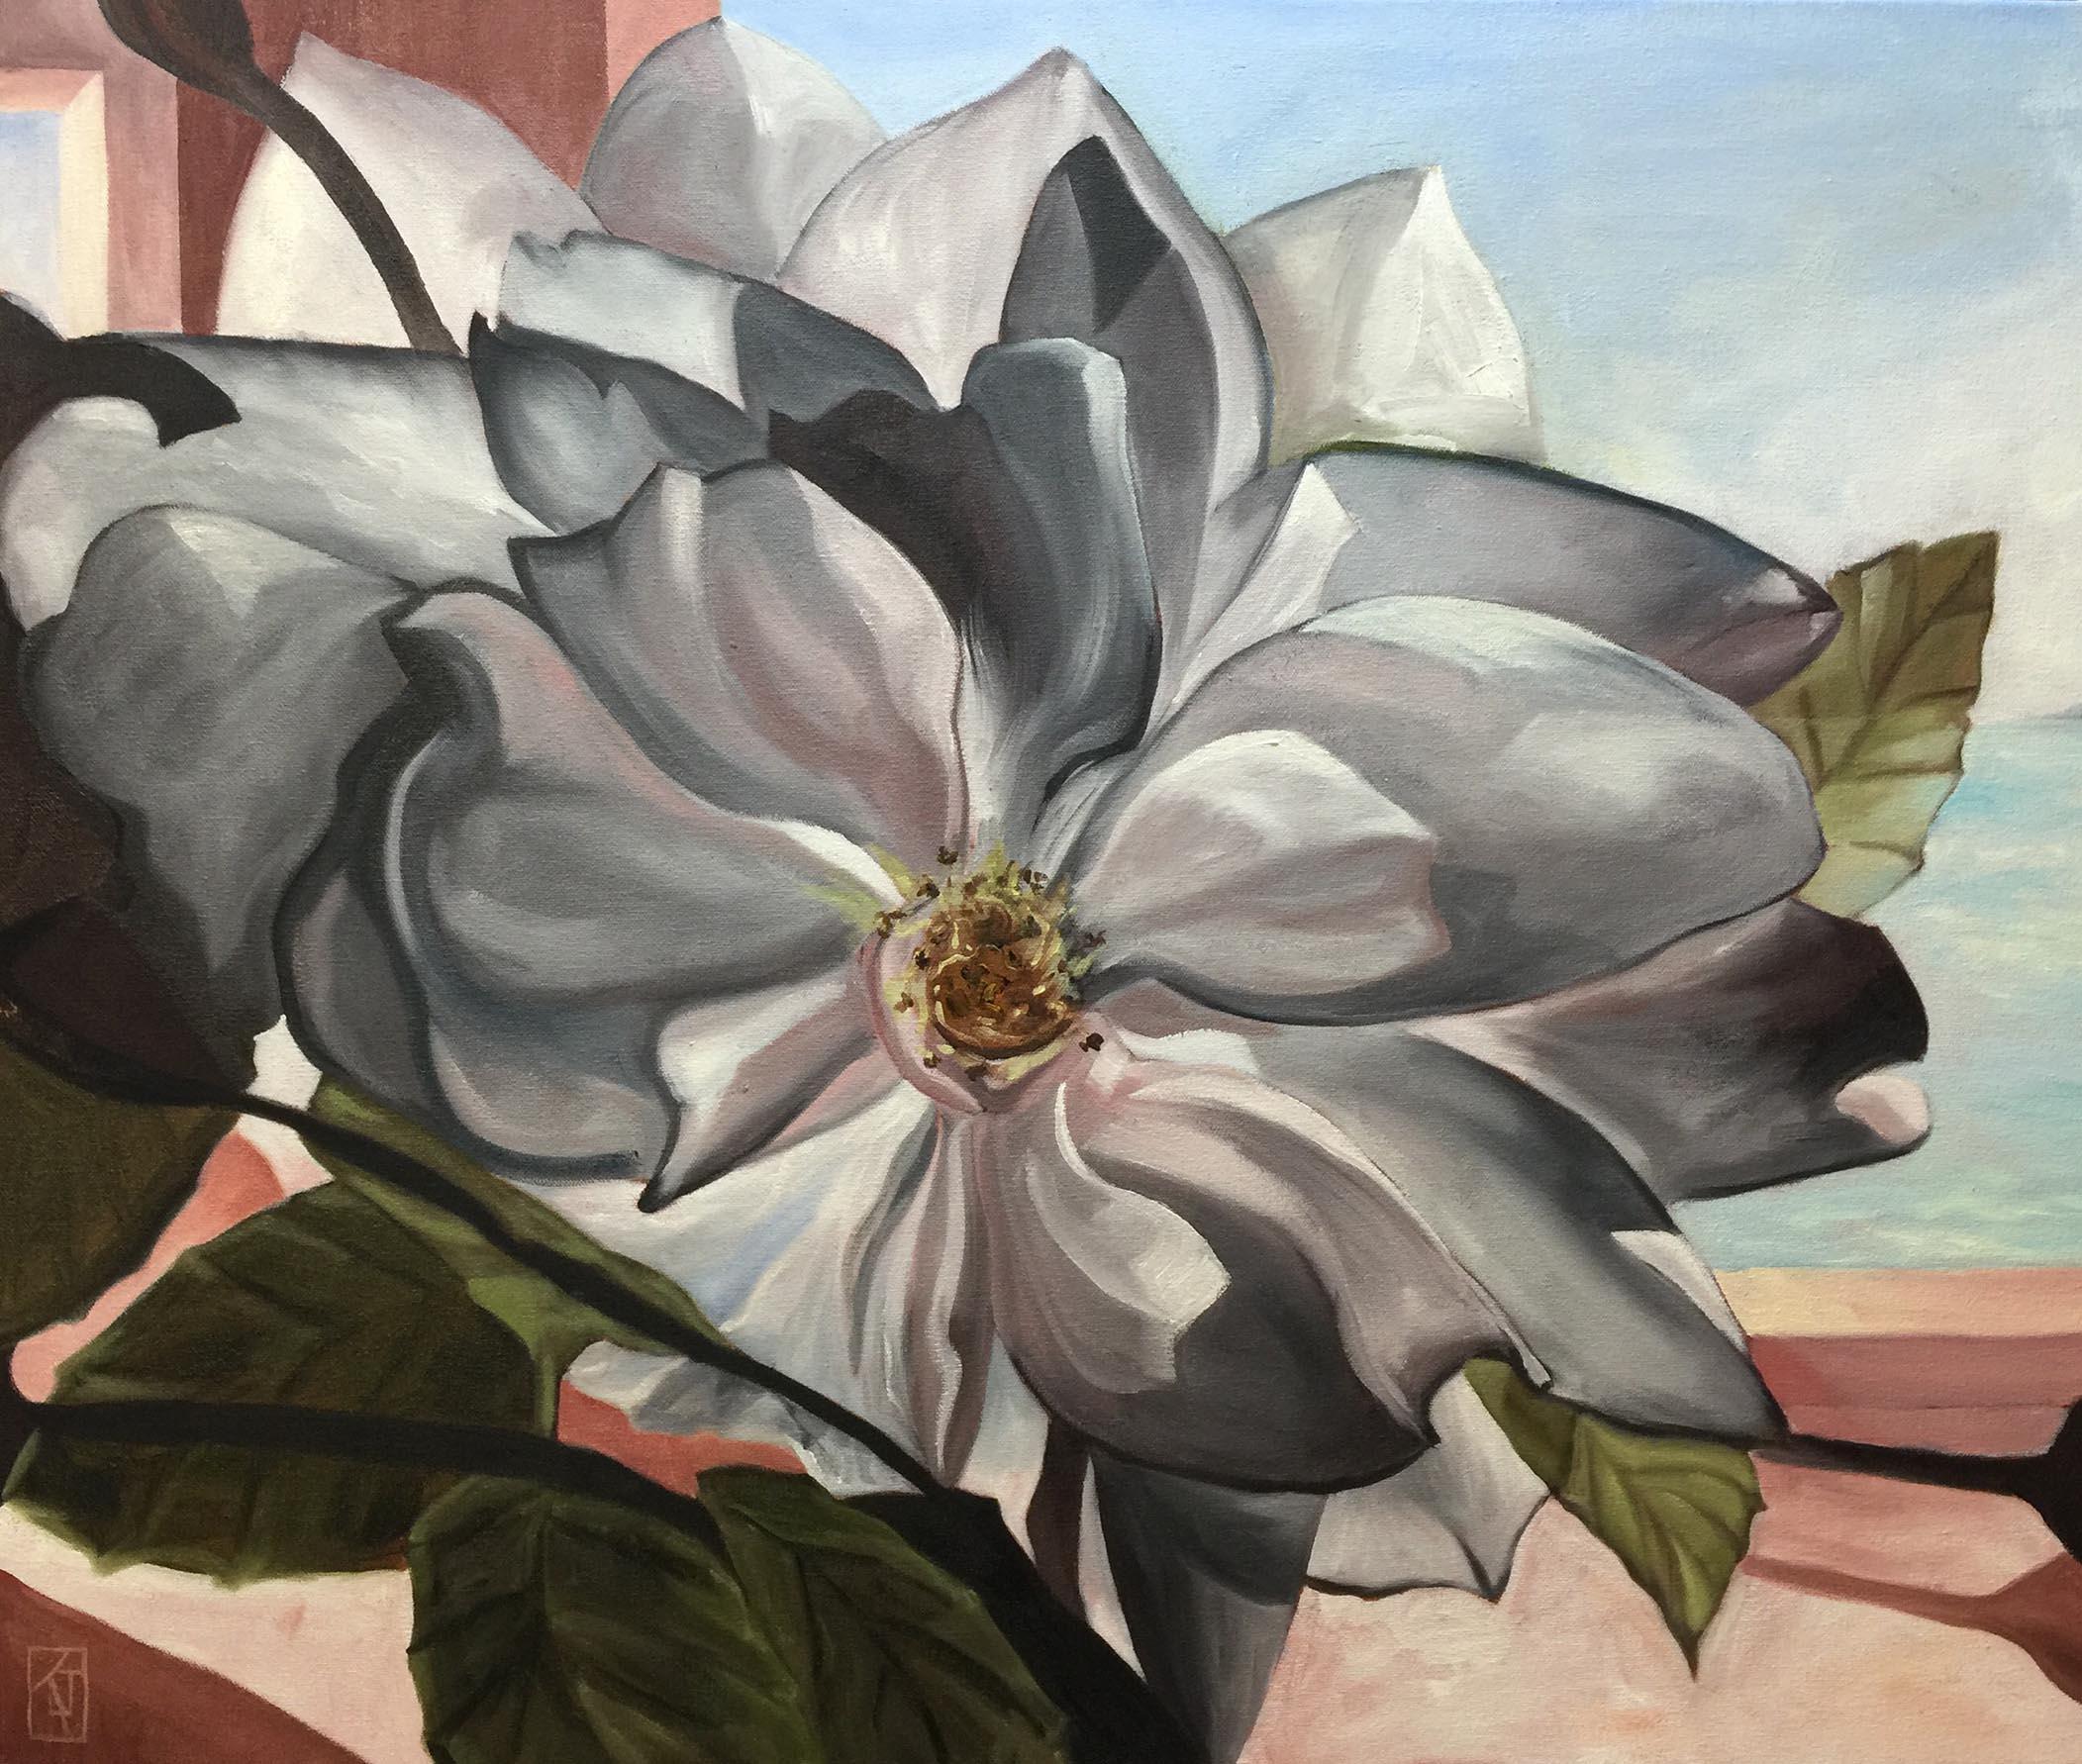 floral art,flowers,rose,summer magic,kadira jennings